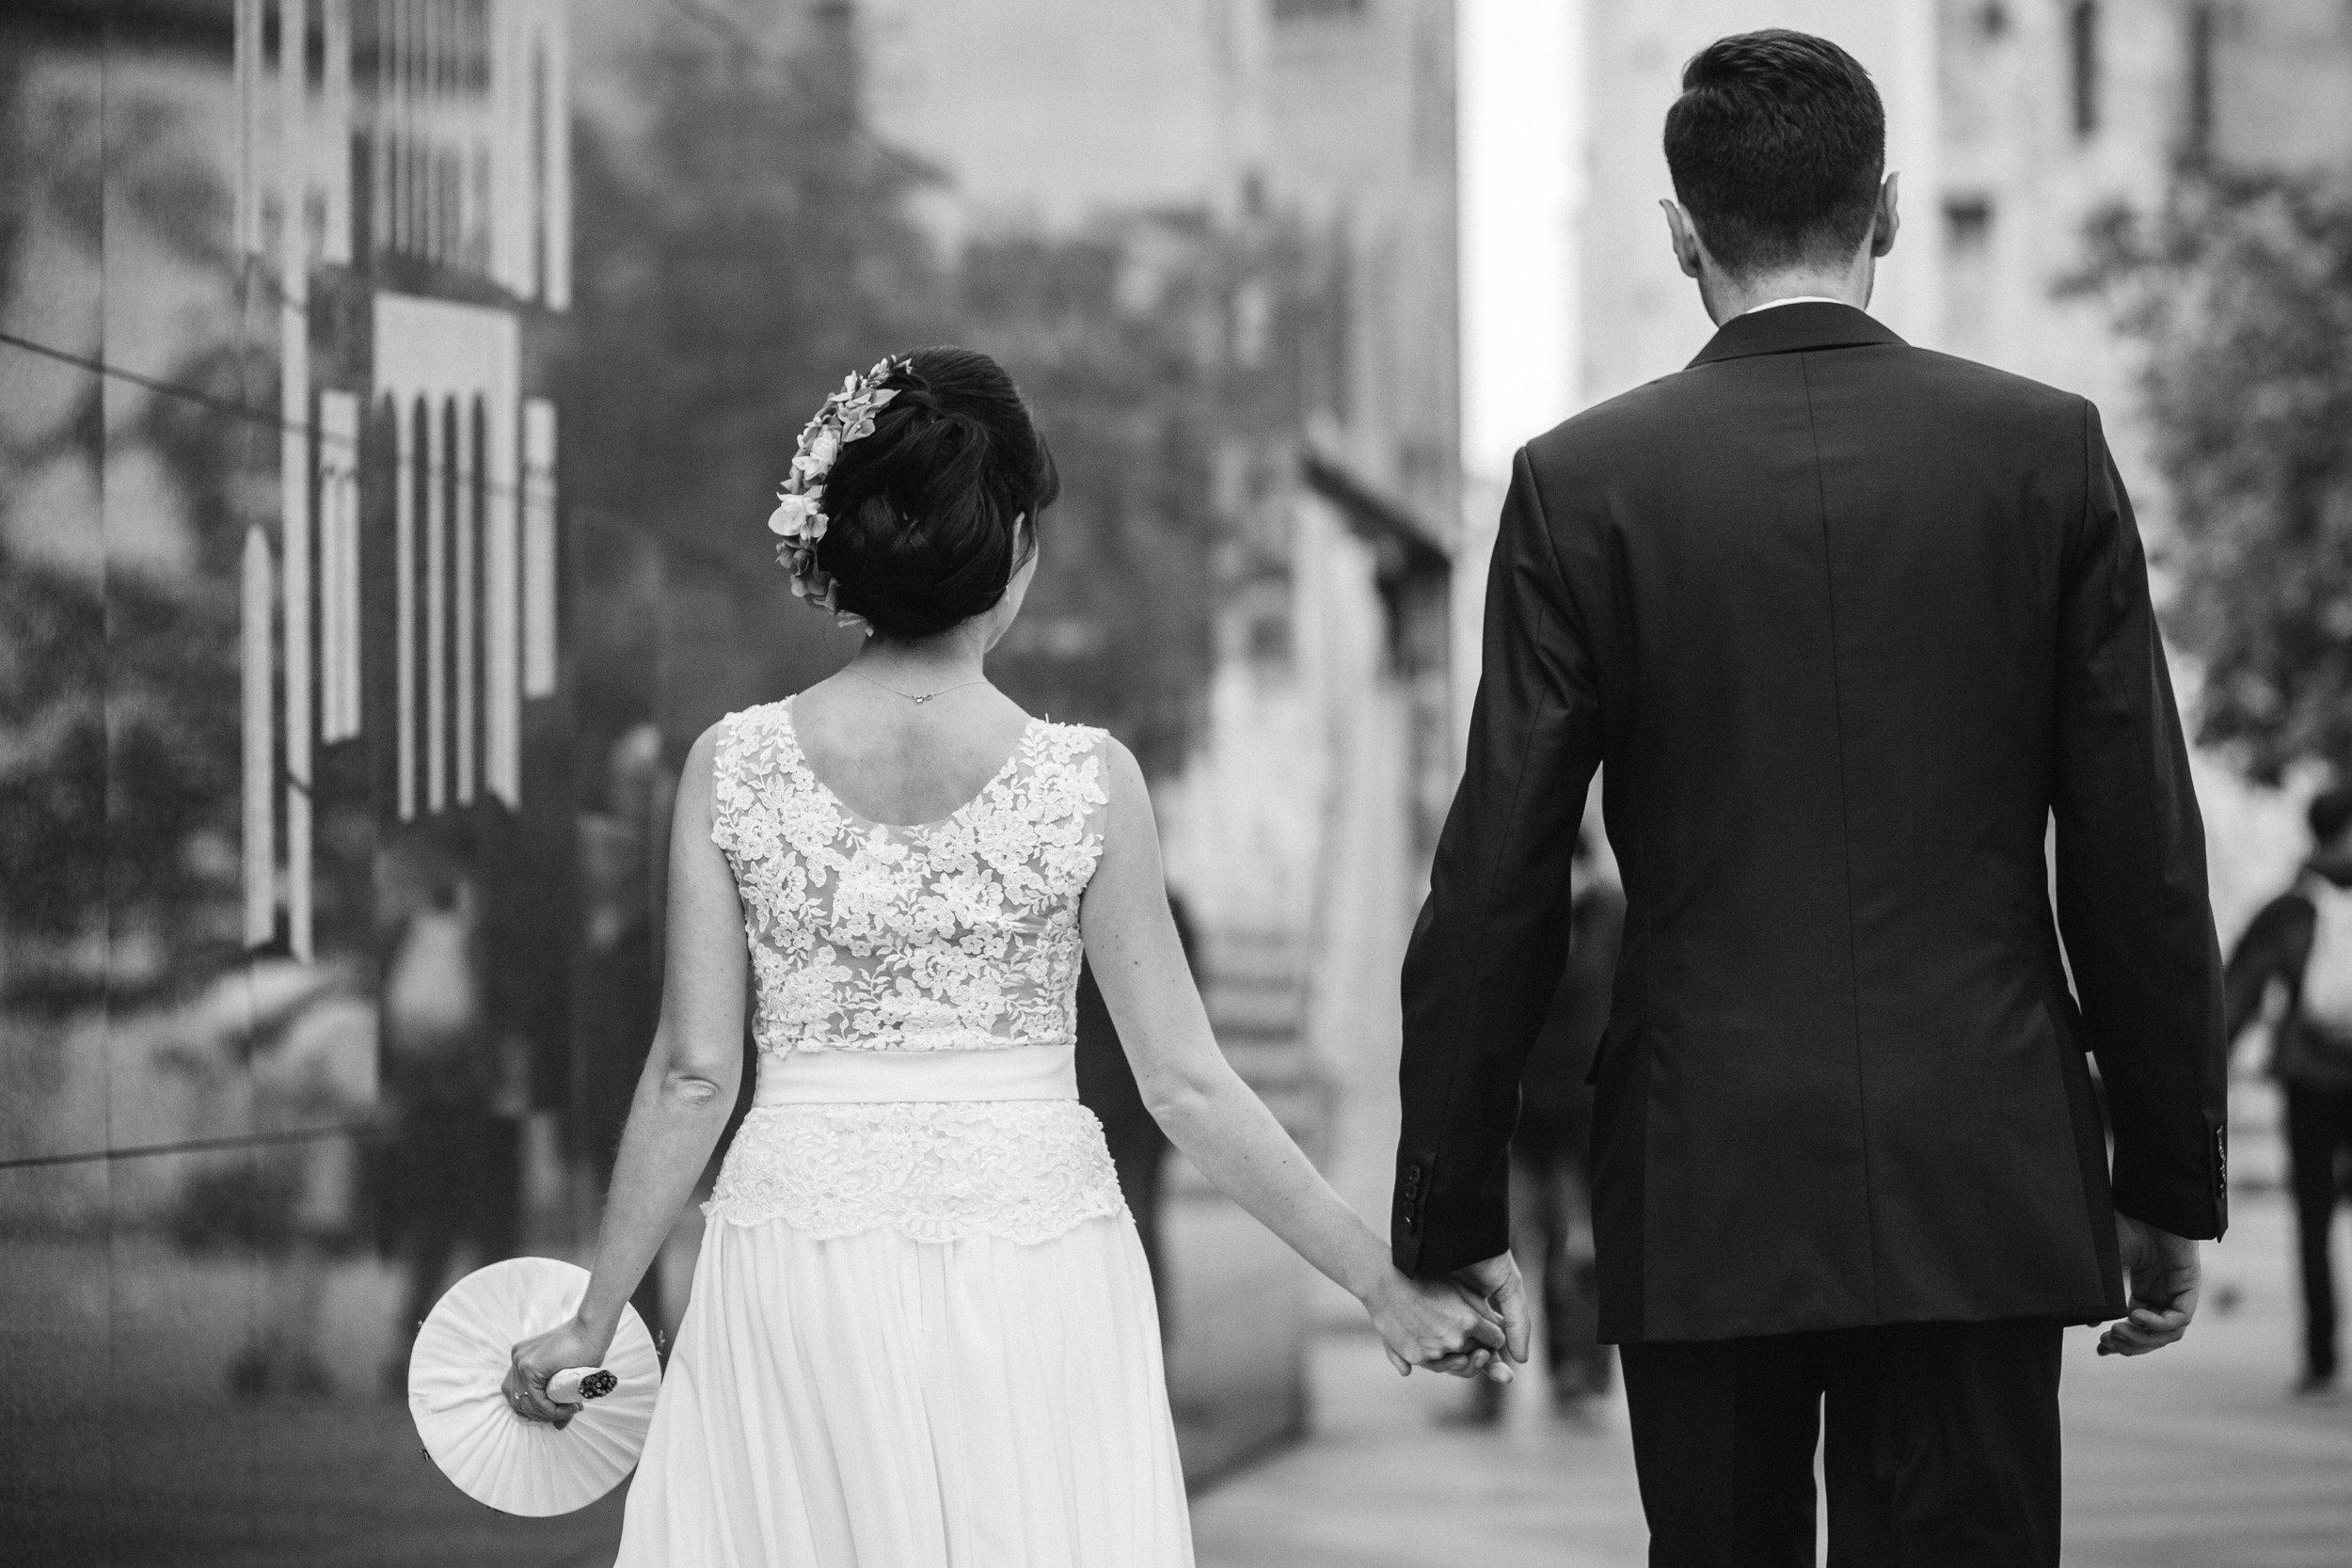 destination-wedding-photographer-bratislava-slovakia-europe-portrait-session-bw-2.jpg